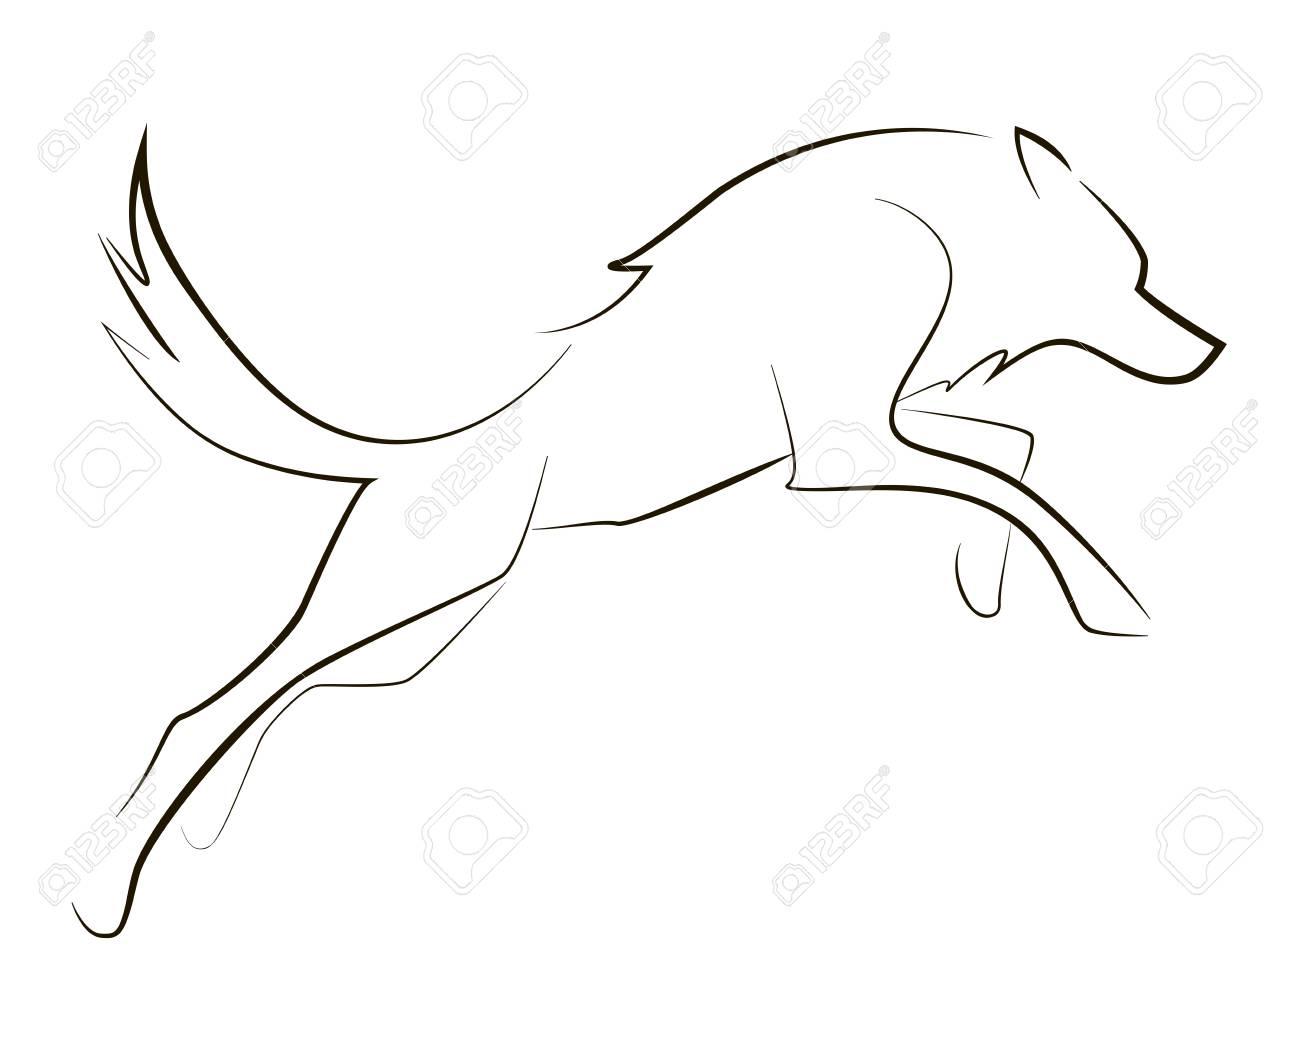 Running black line wolf on white background. Vector graphic. - 108858267